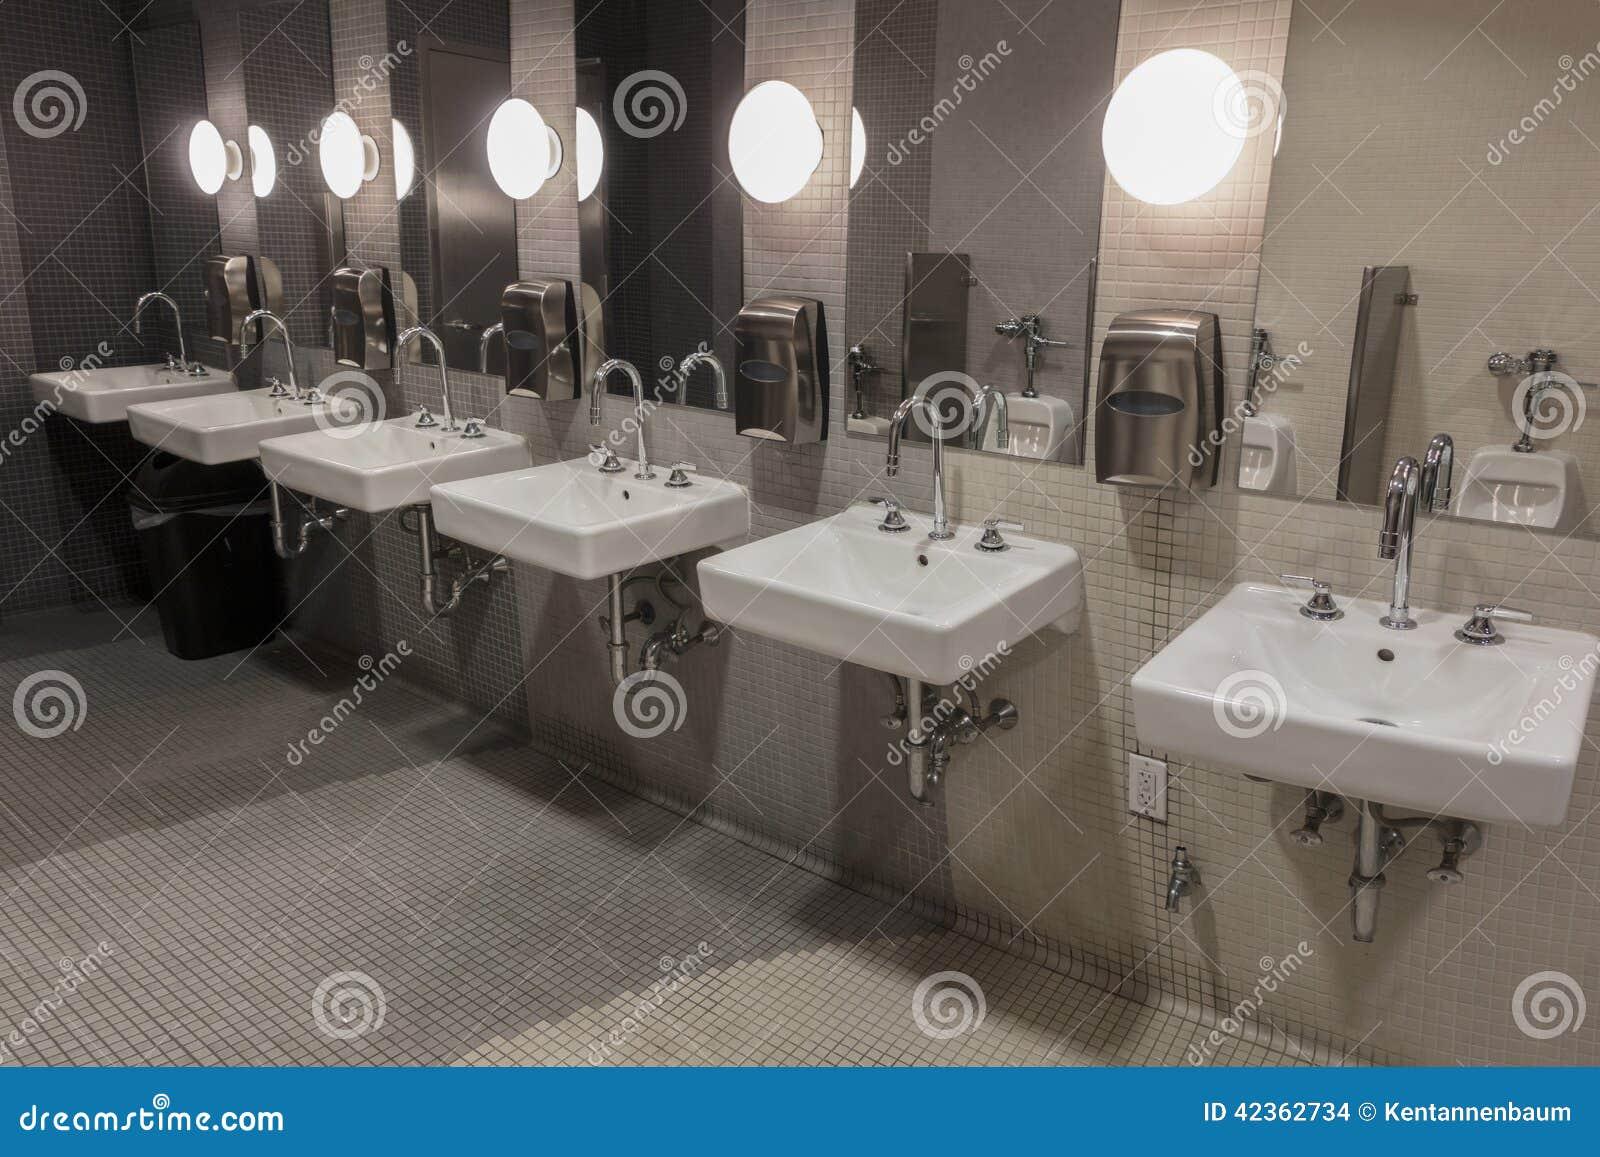 Sinks in public restroom stock photo image of hygiene for Public bathroom sink